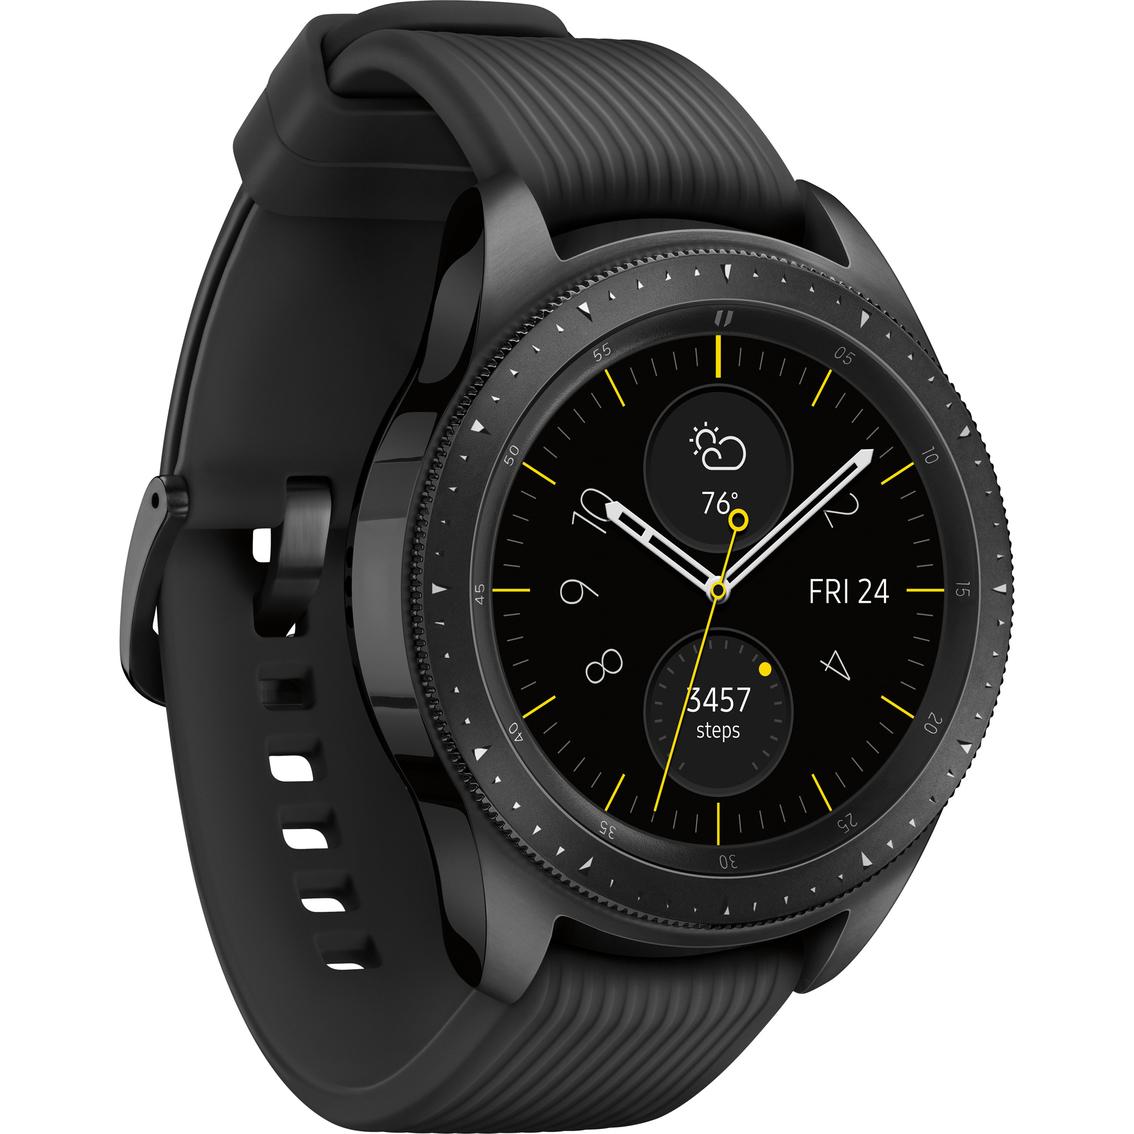 Samsung Galaxy Watch Bluetooth 42mm Smr800nzsaxar | Fitness